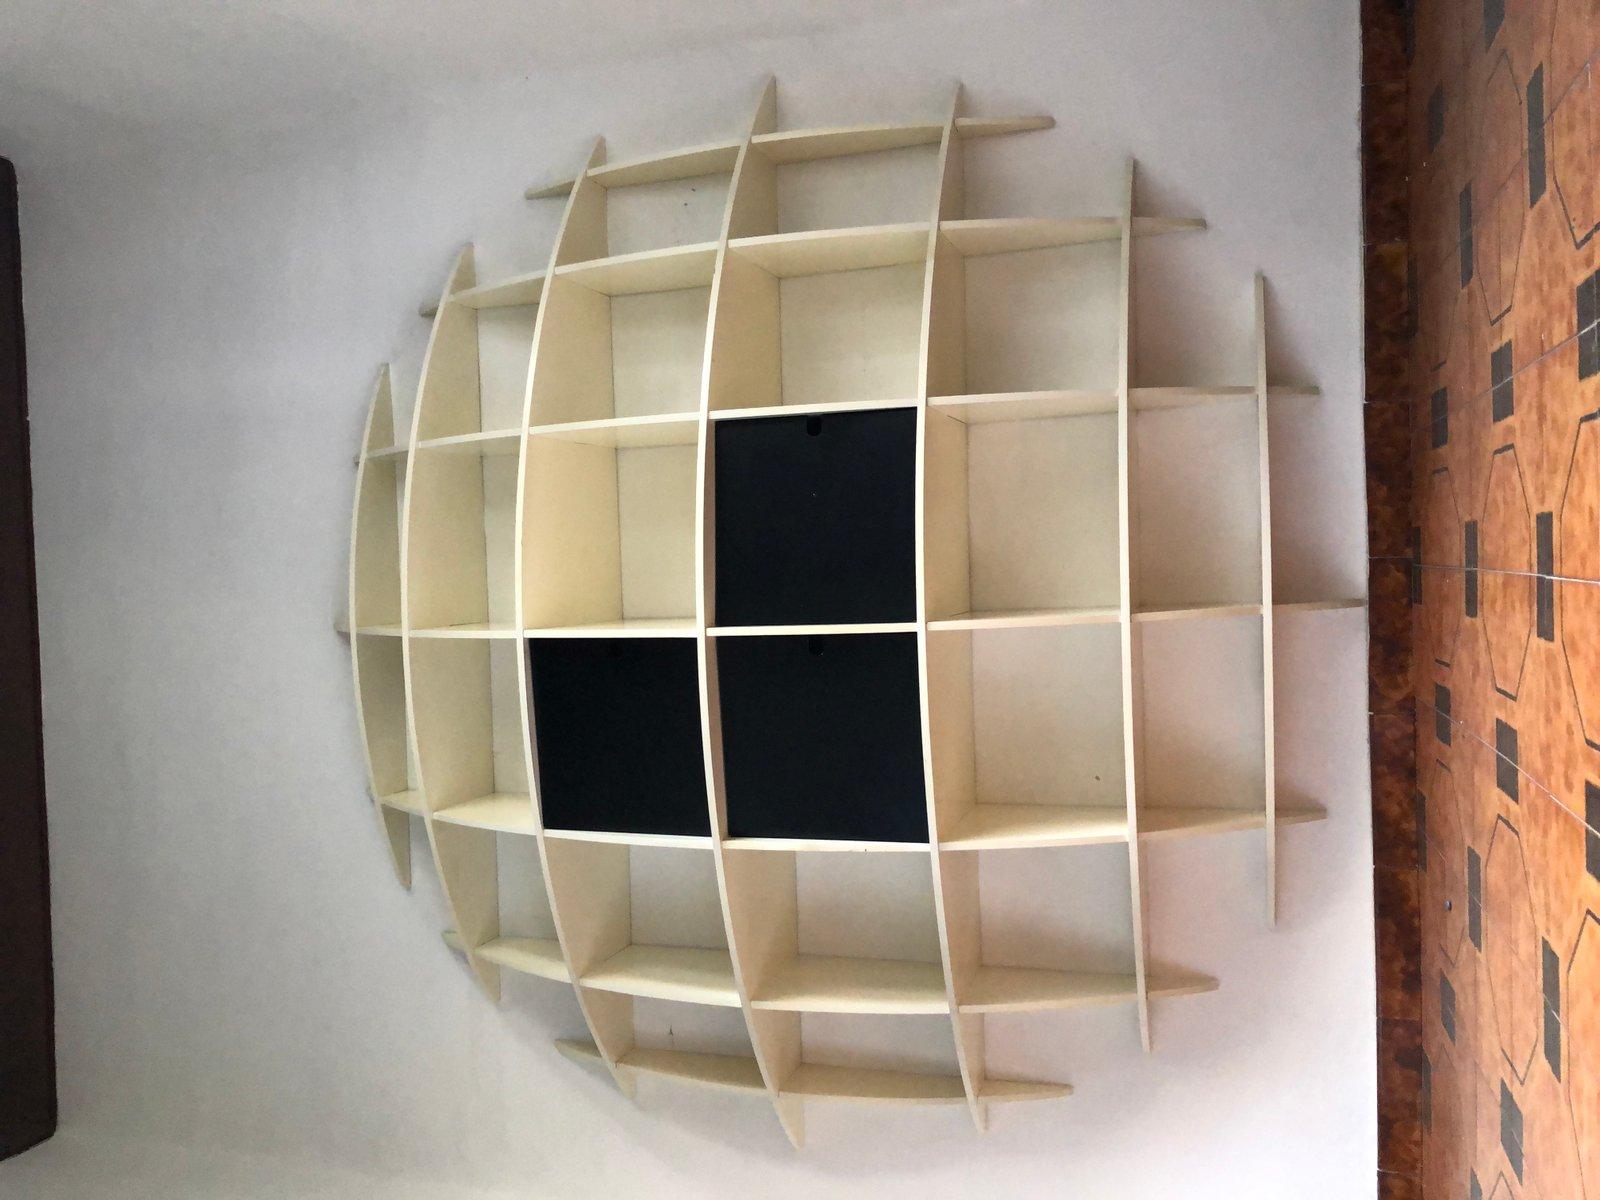 wei lackiertes modell tyco b cherregal aus holz von. Black Bedroom Furniture Sets. Home Design Ideas